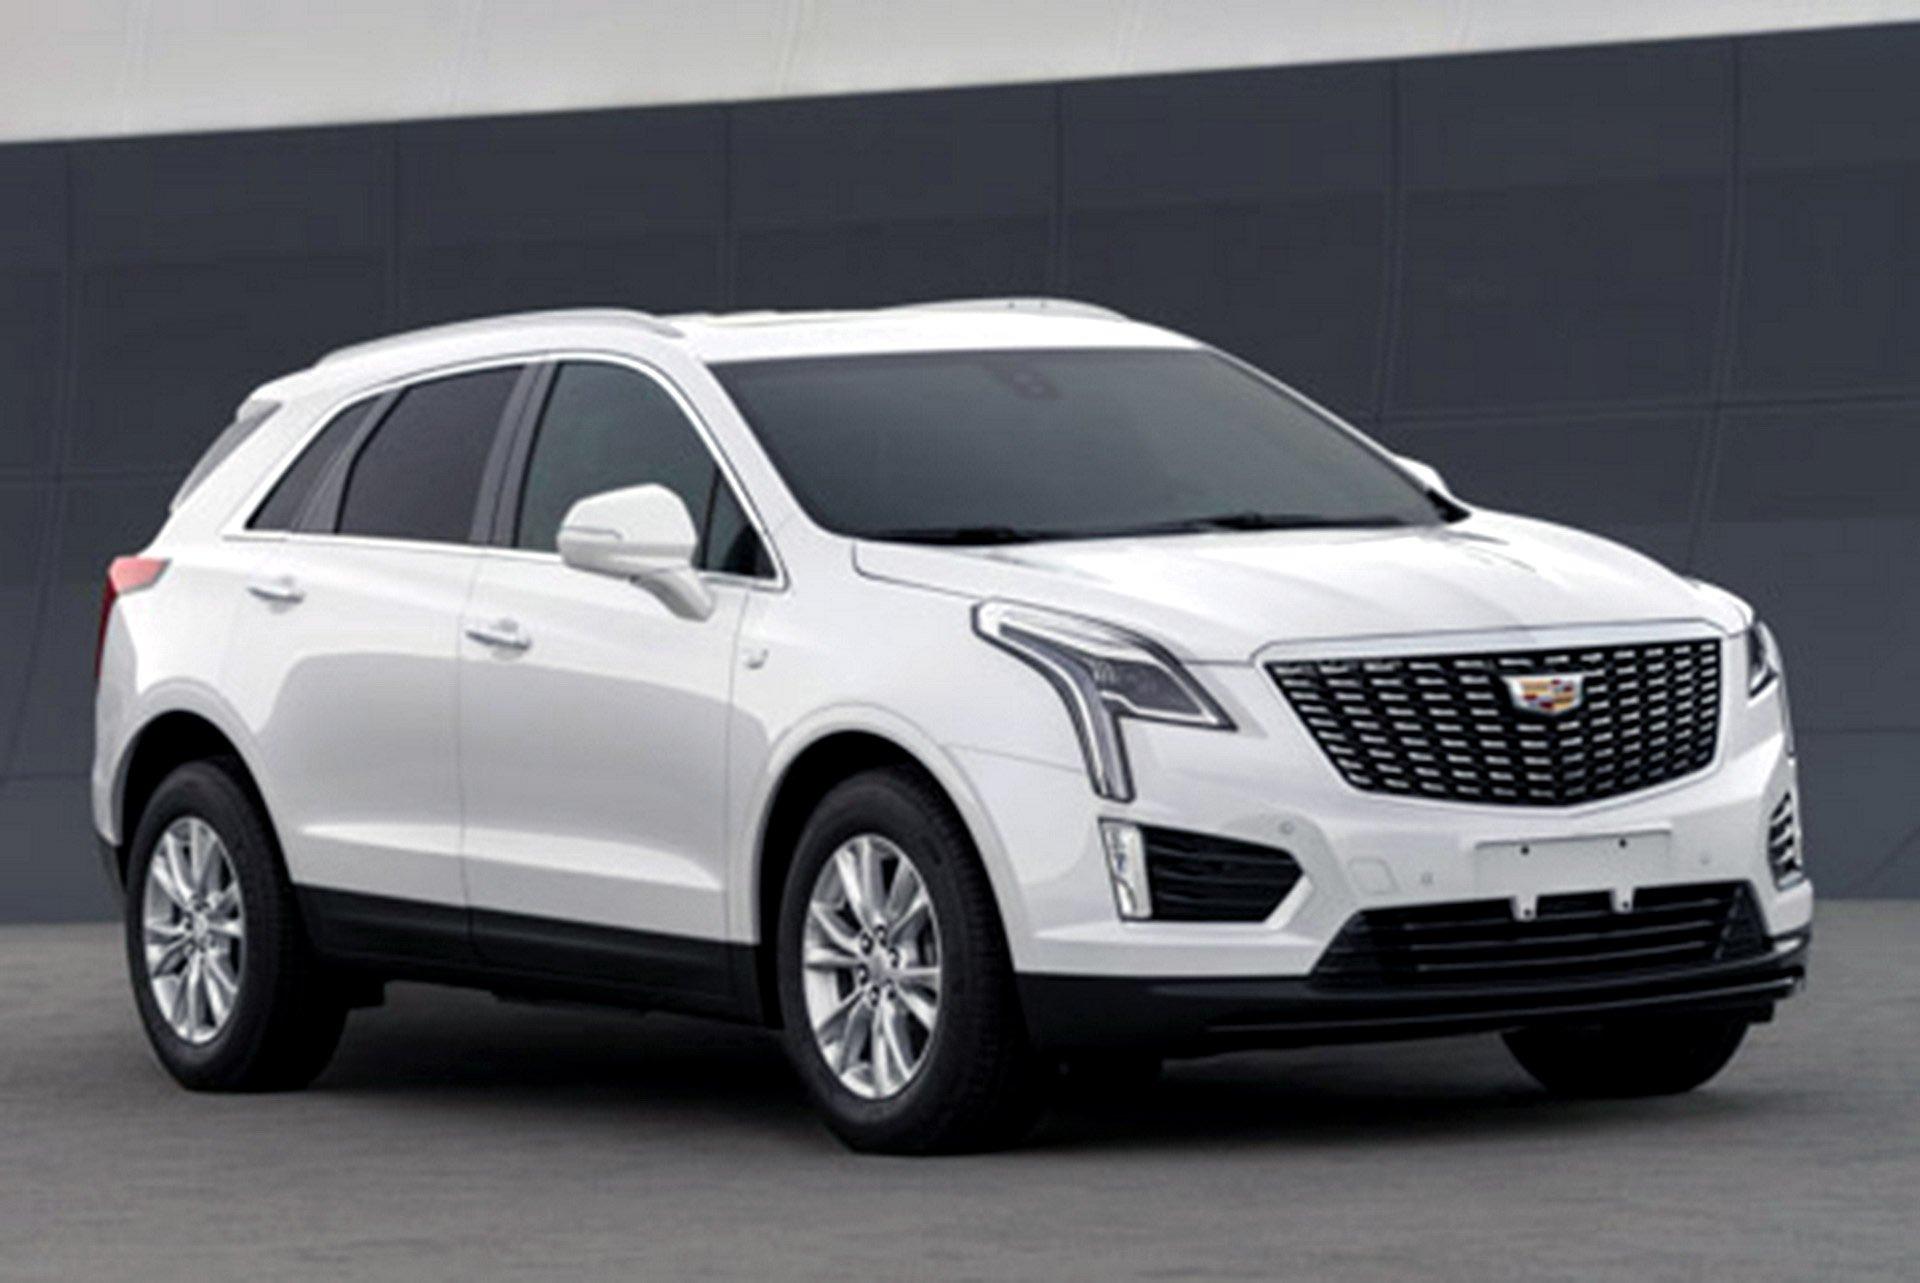 2020 Cadillac Xt5 Leak Minor Refresh For Popular Crossover